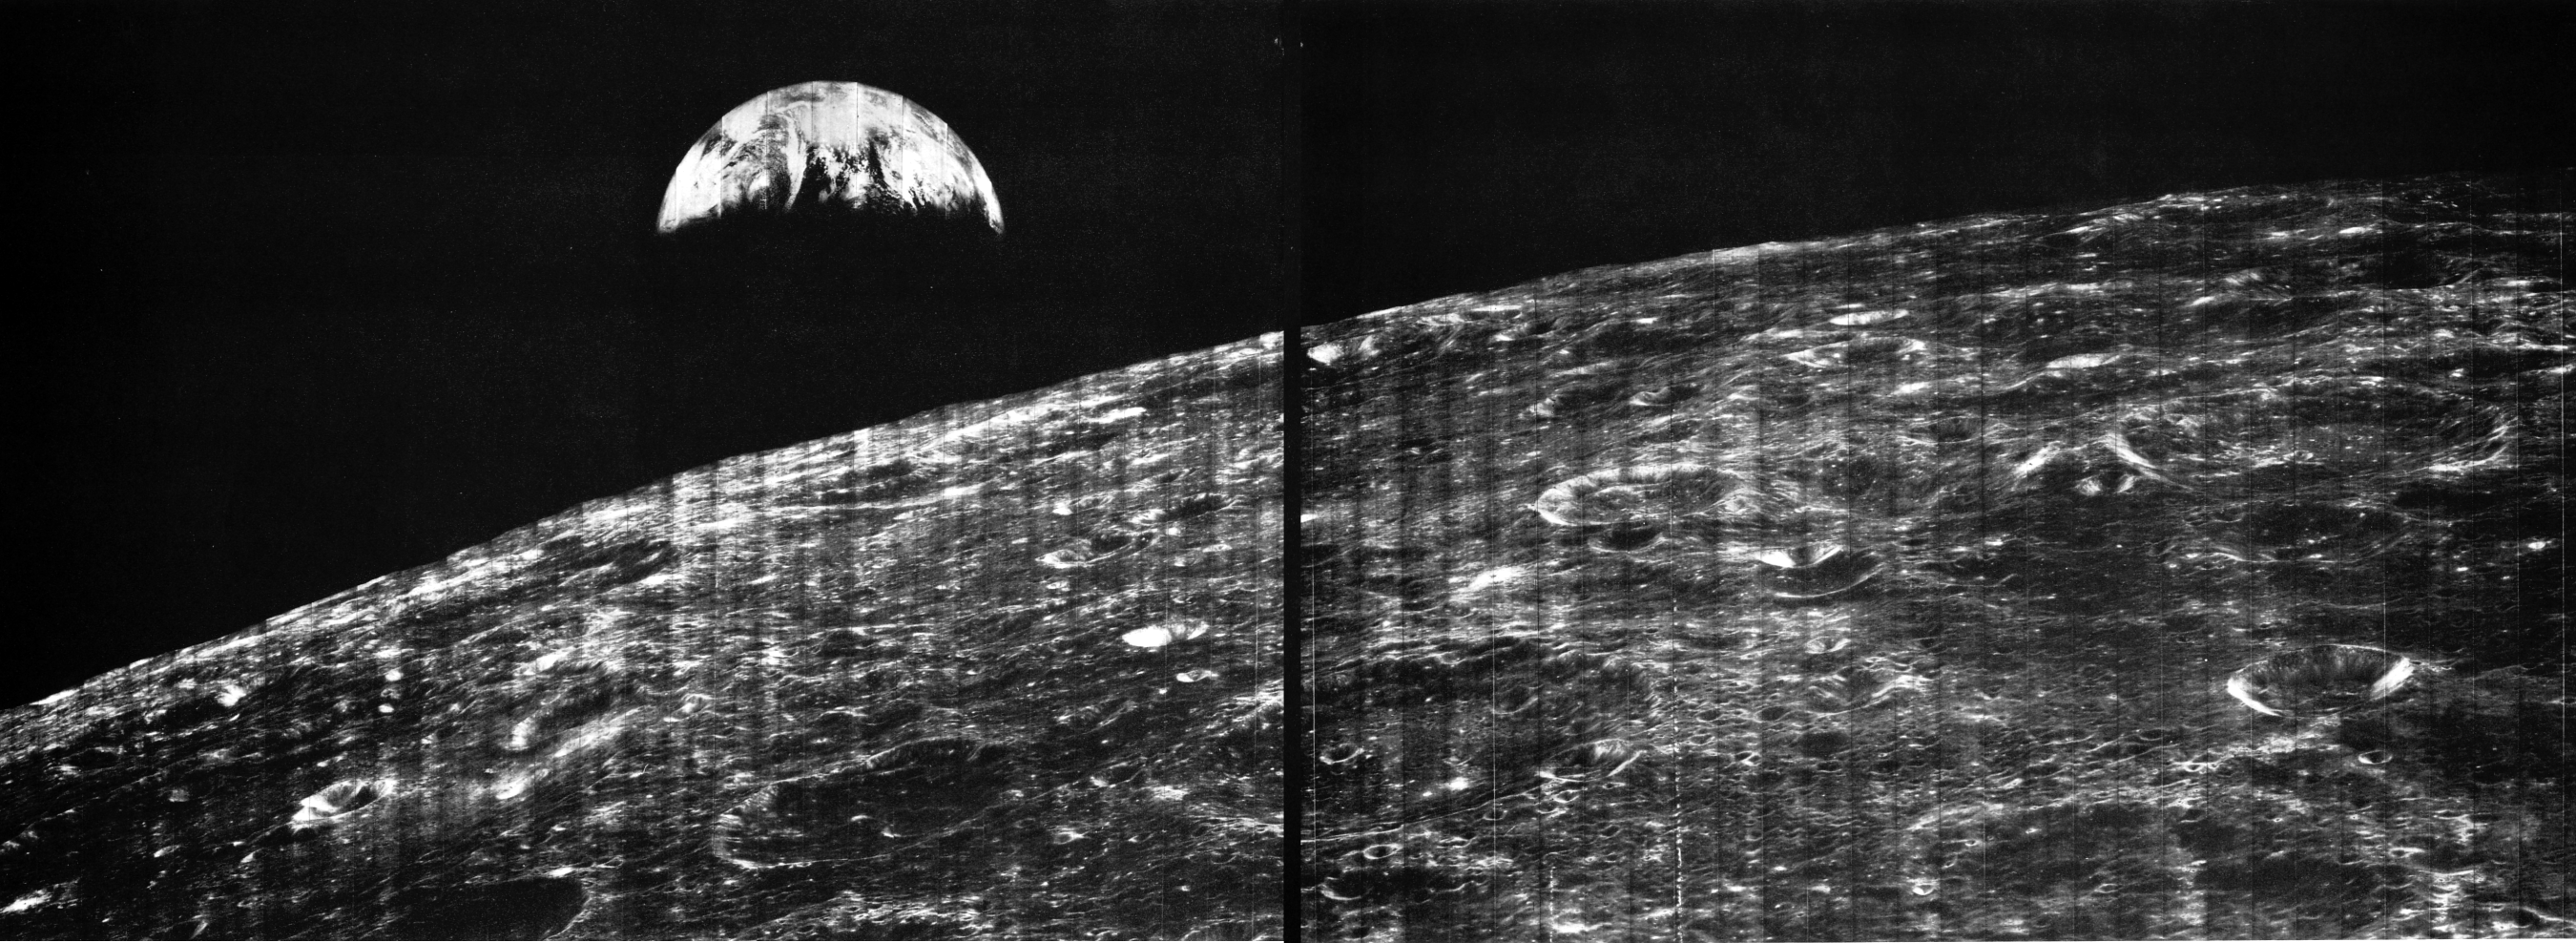 youtube nasa moon crash - photo #47